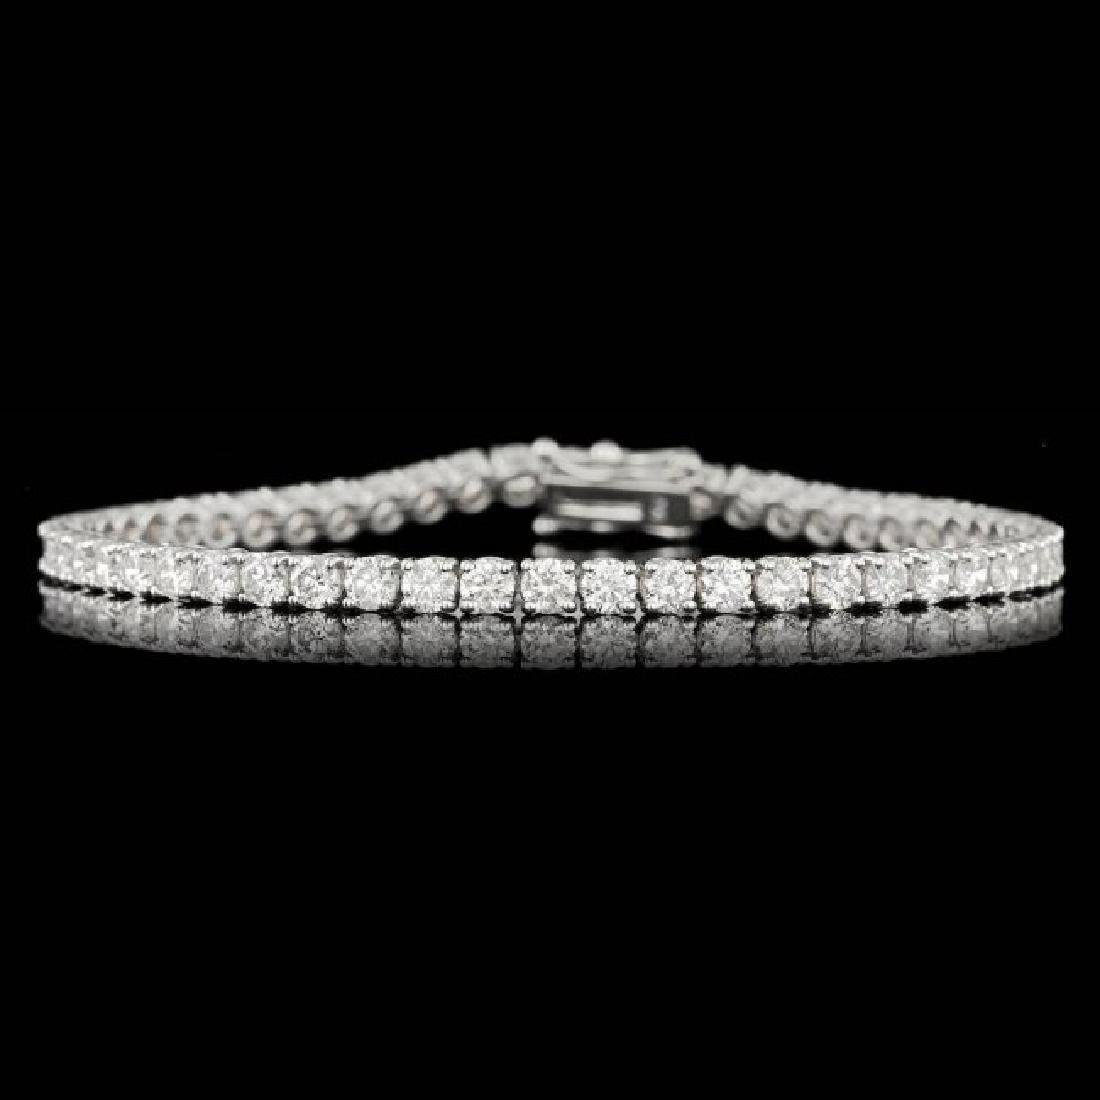 18k White Gold 6.55ct Diamond Bracelet